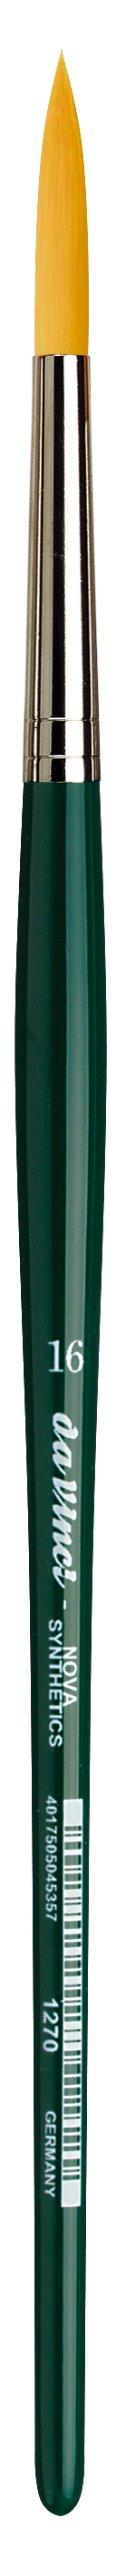 da Vinci Nova Series 1270 Lettering/Liner Brush, Lettering/Liner Medium Pointed Synthetic, Size 16